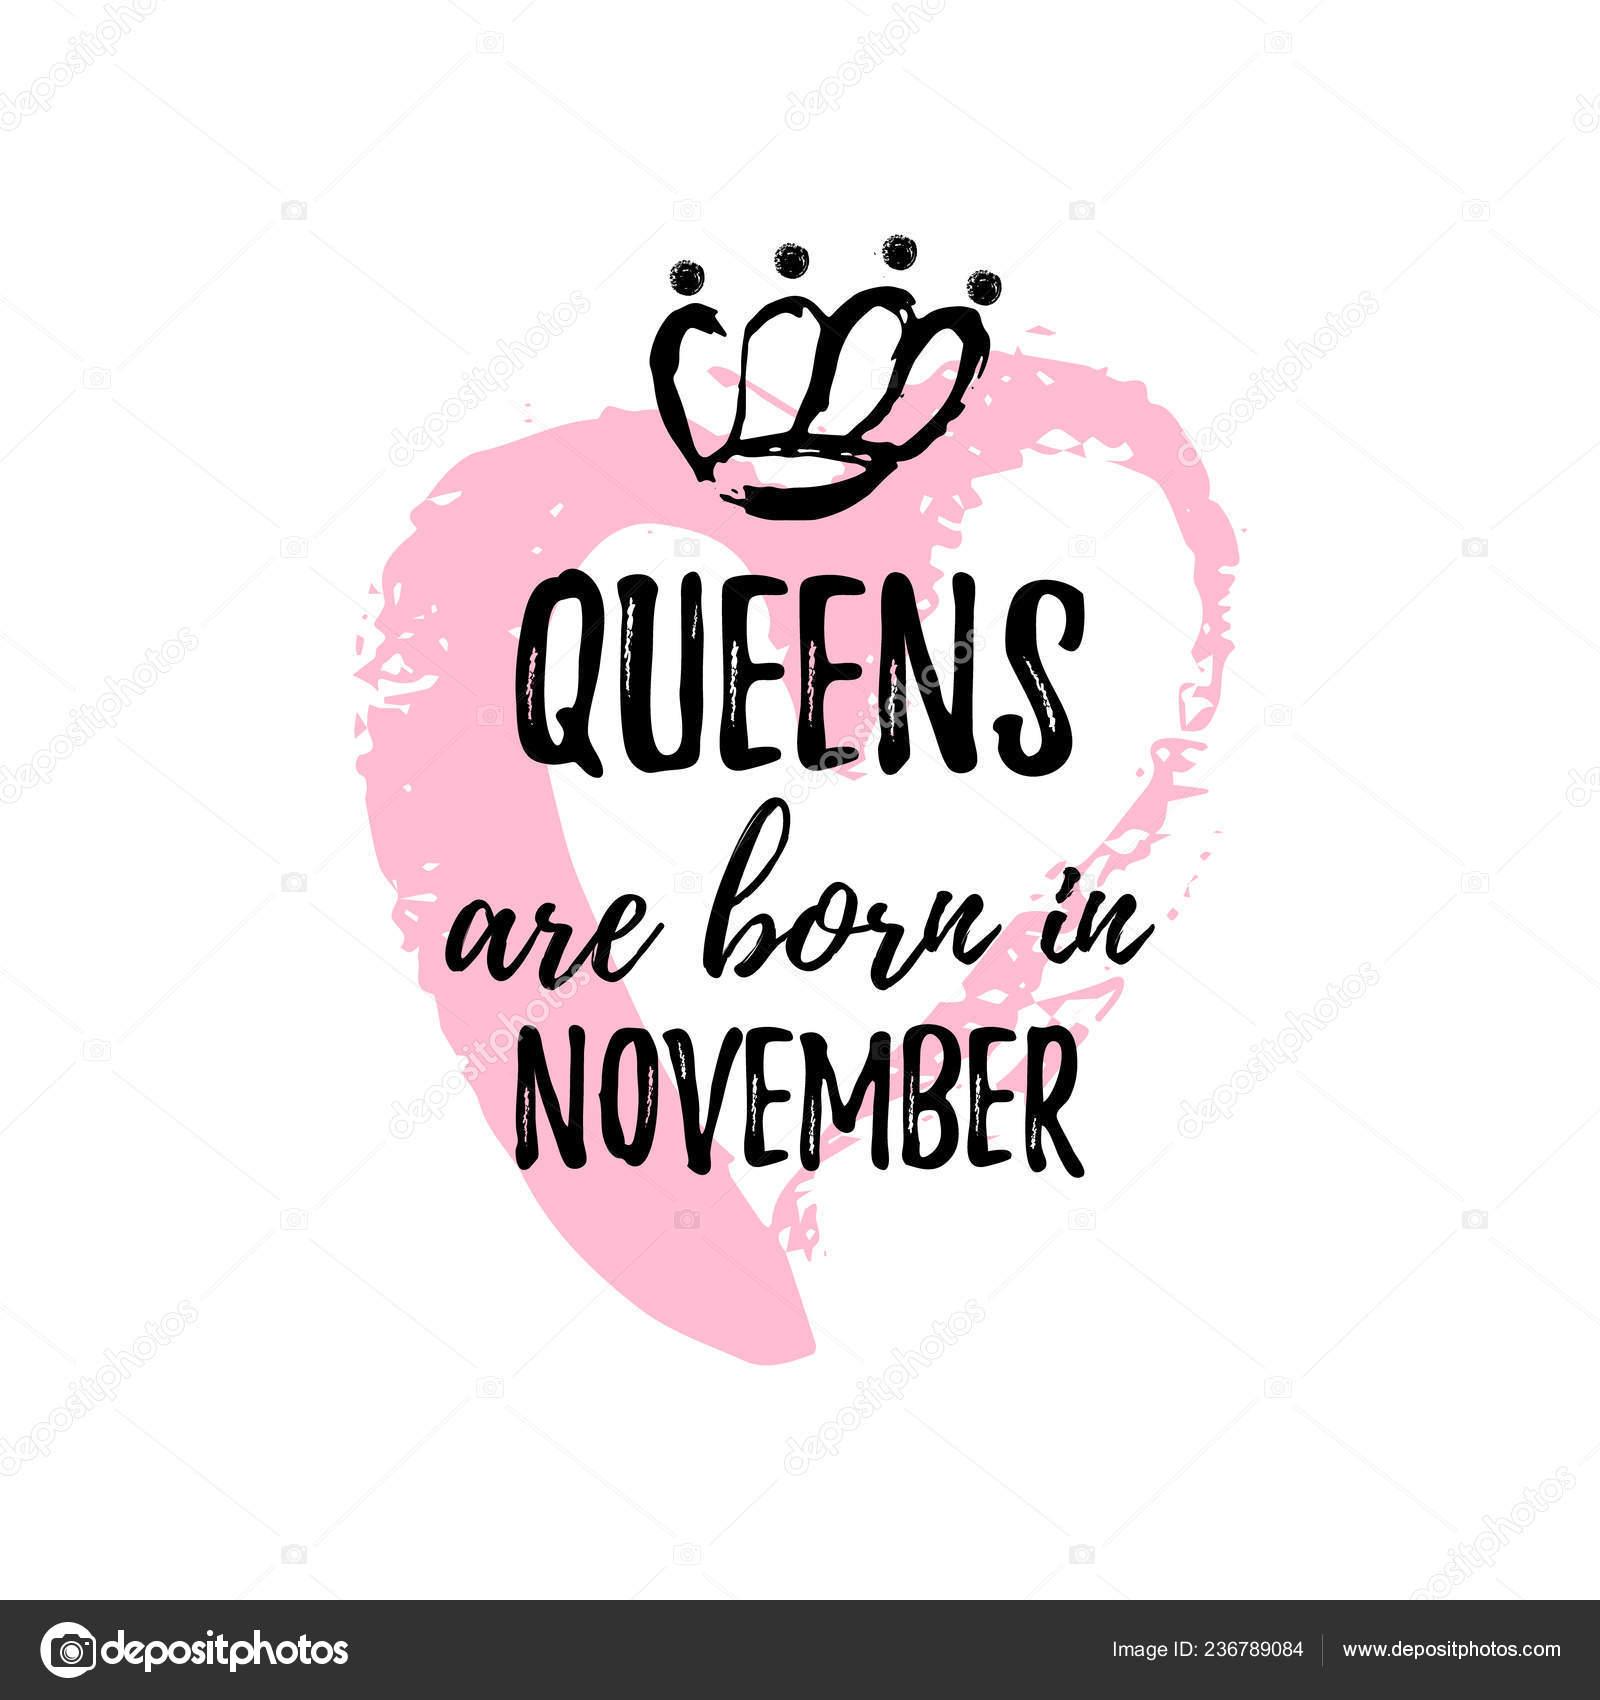 4a6b4df6 Similar Royalty-free Vectors: Queens Born November Typography Illustration  ...